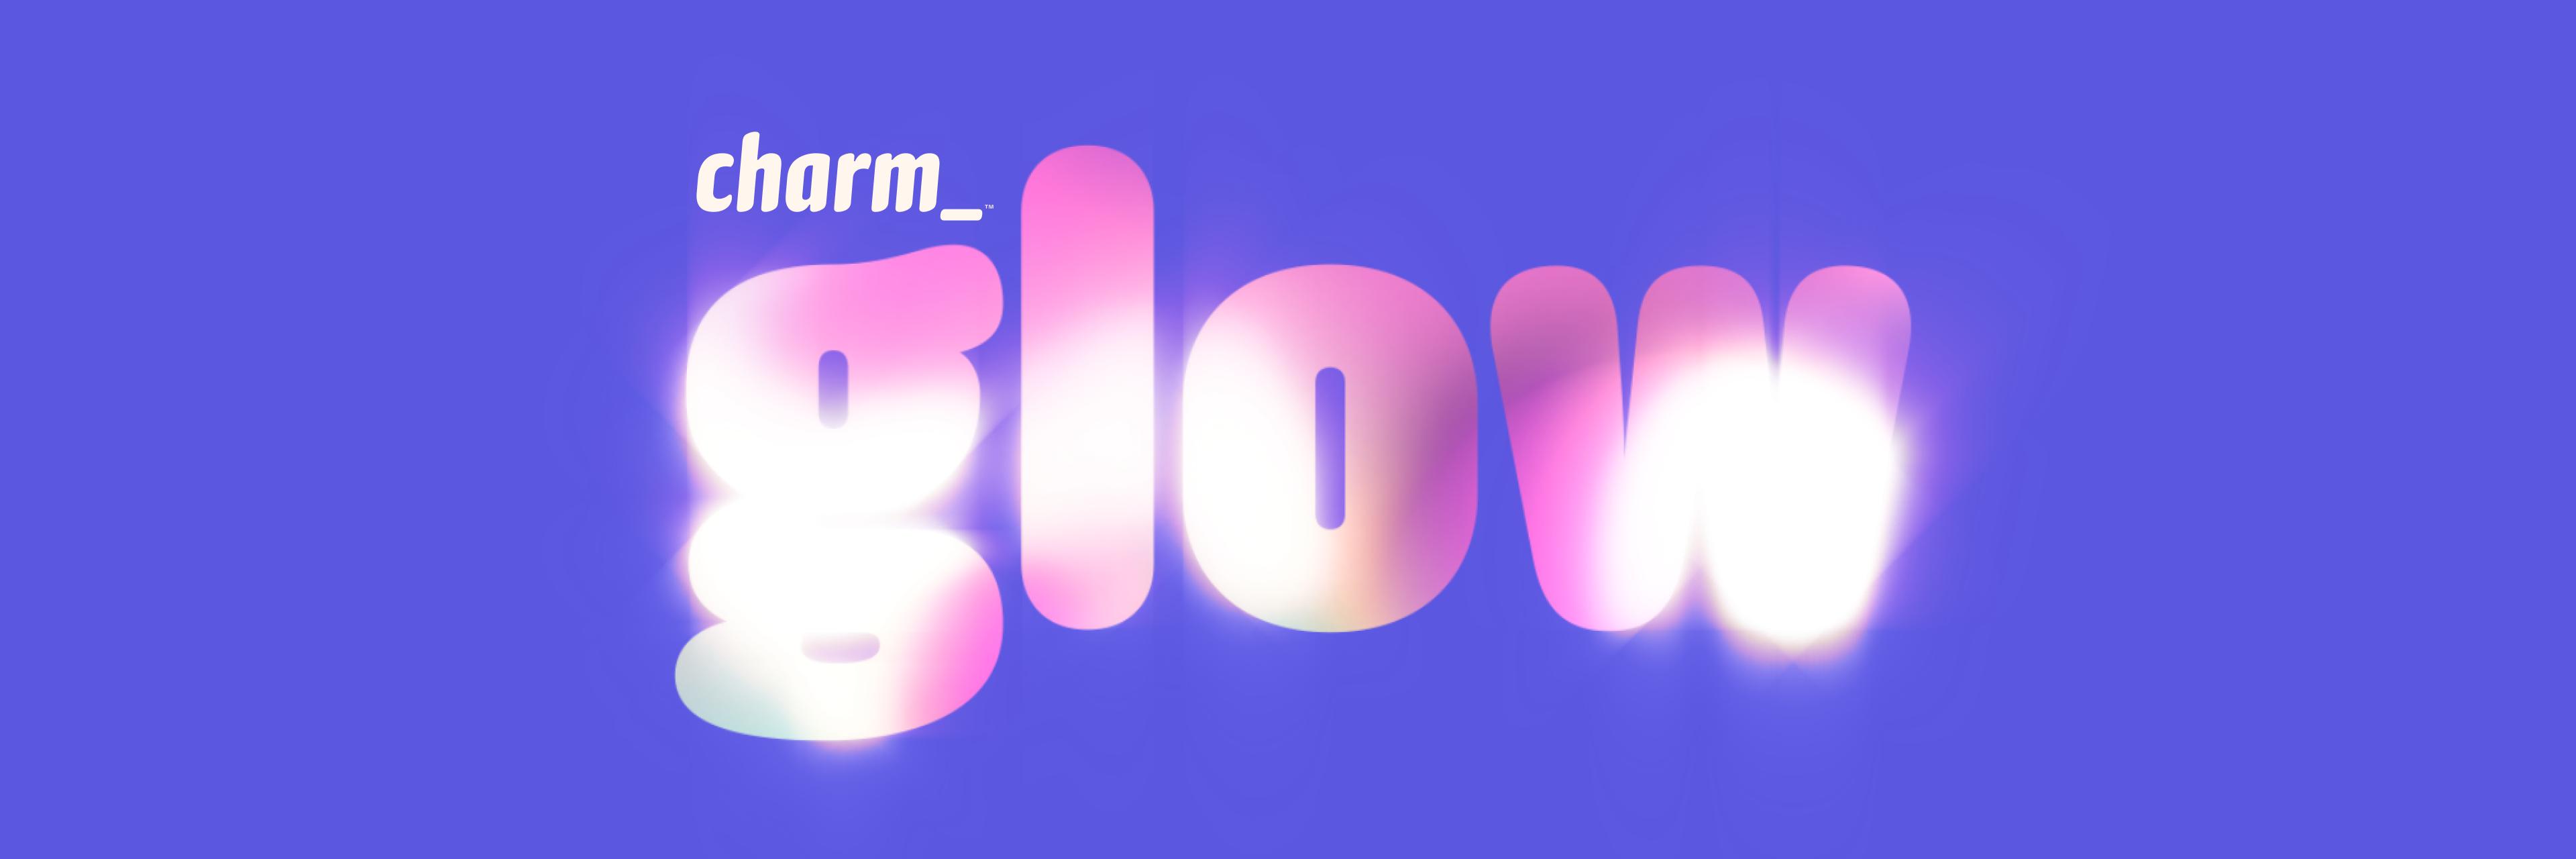 glow banner